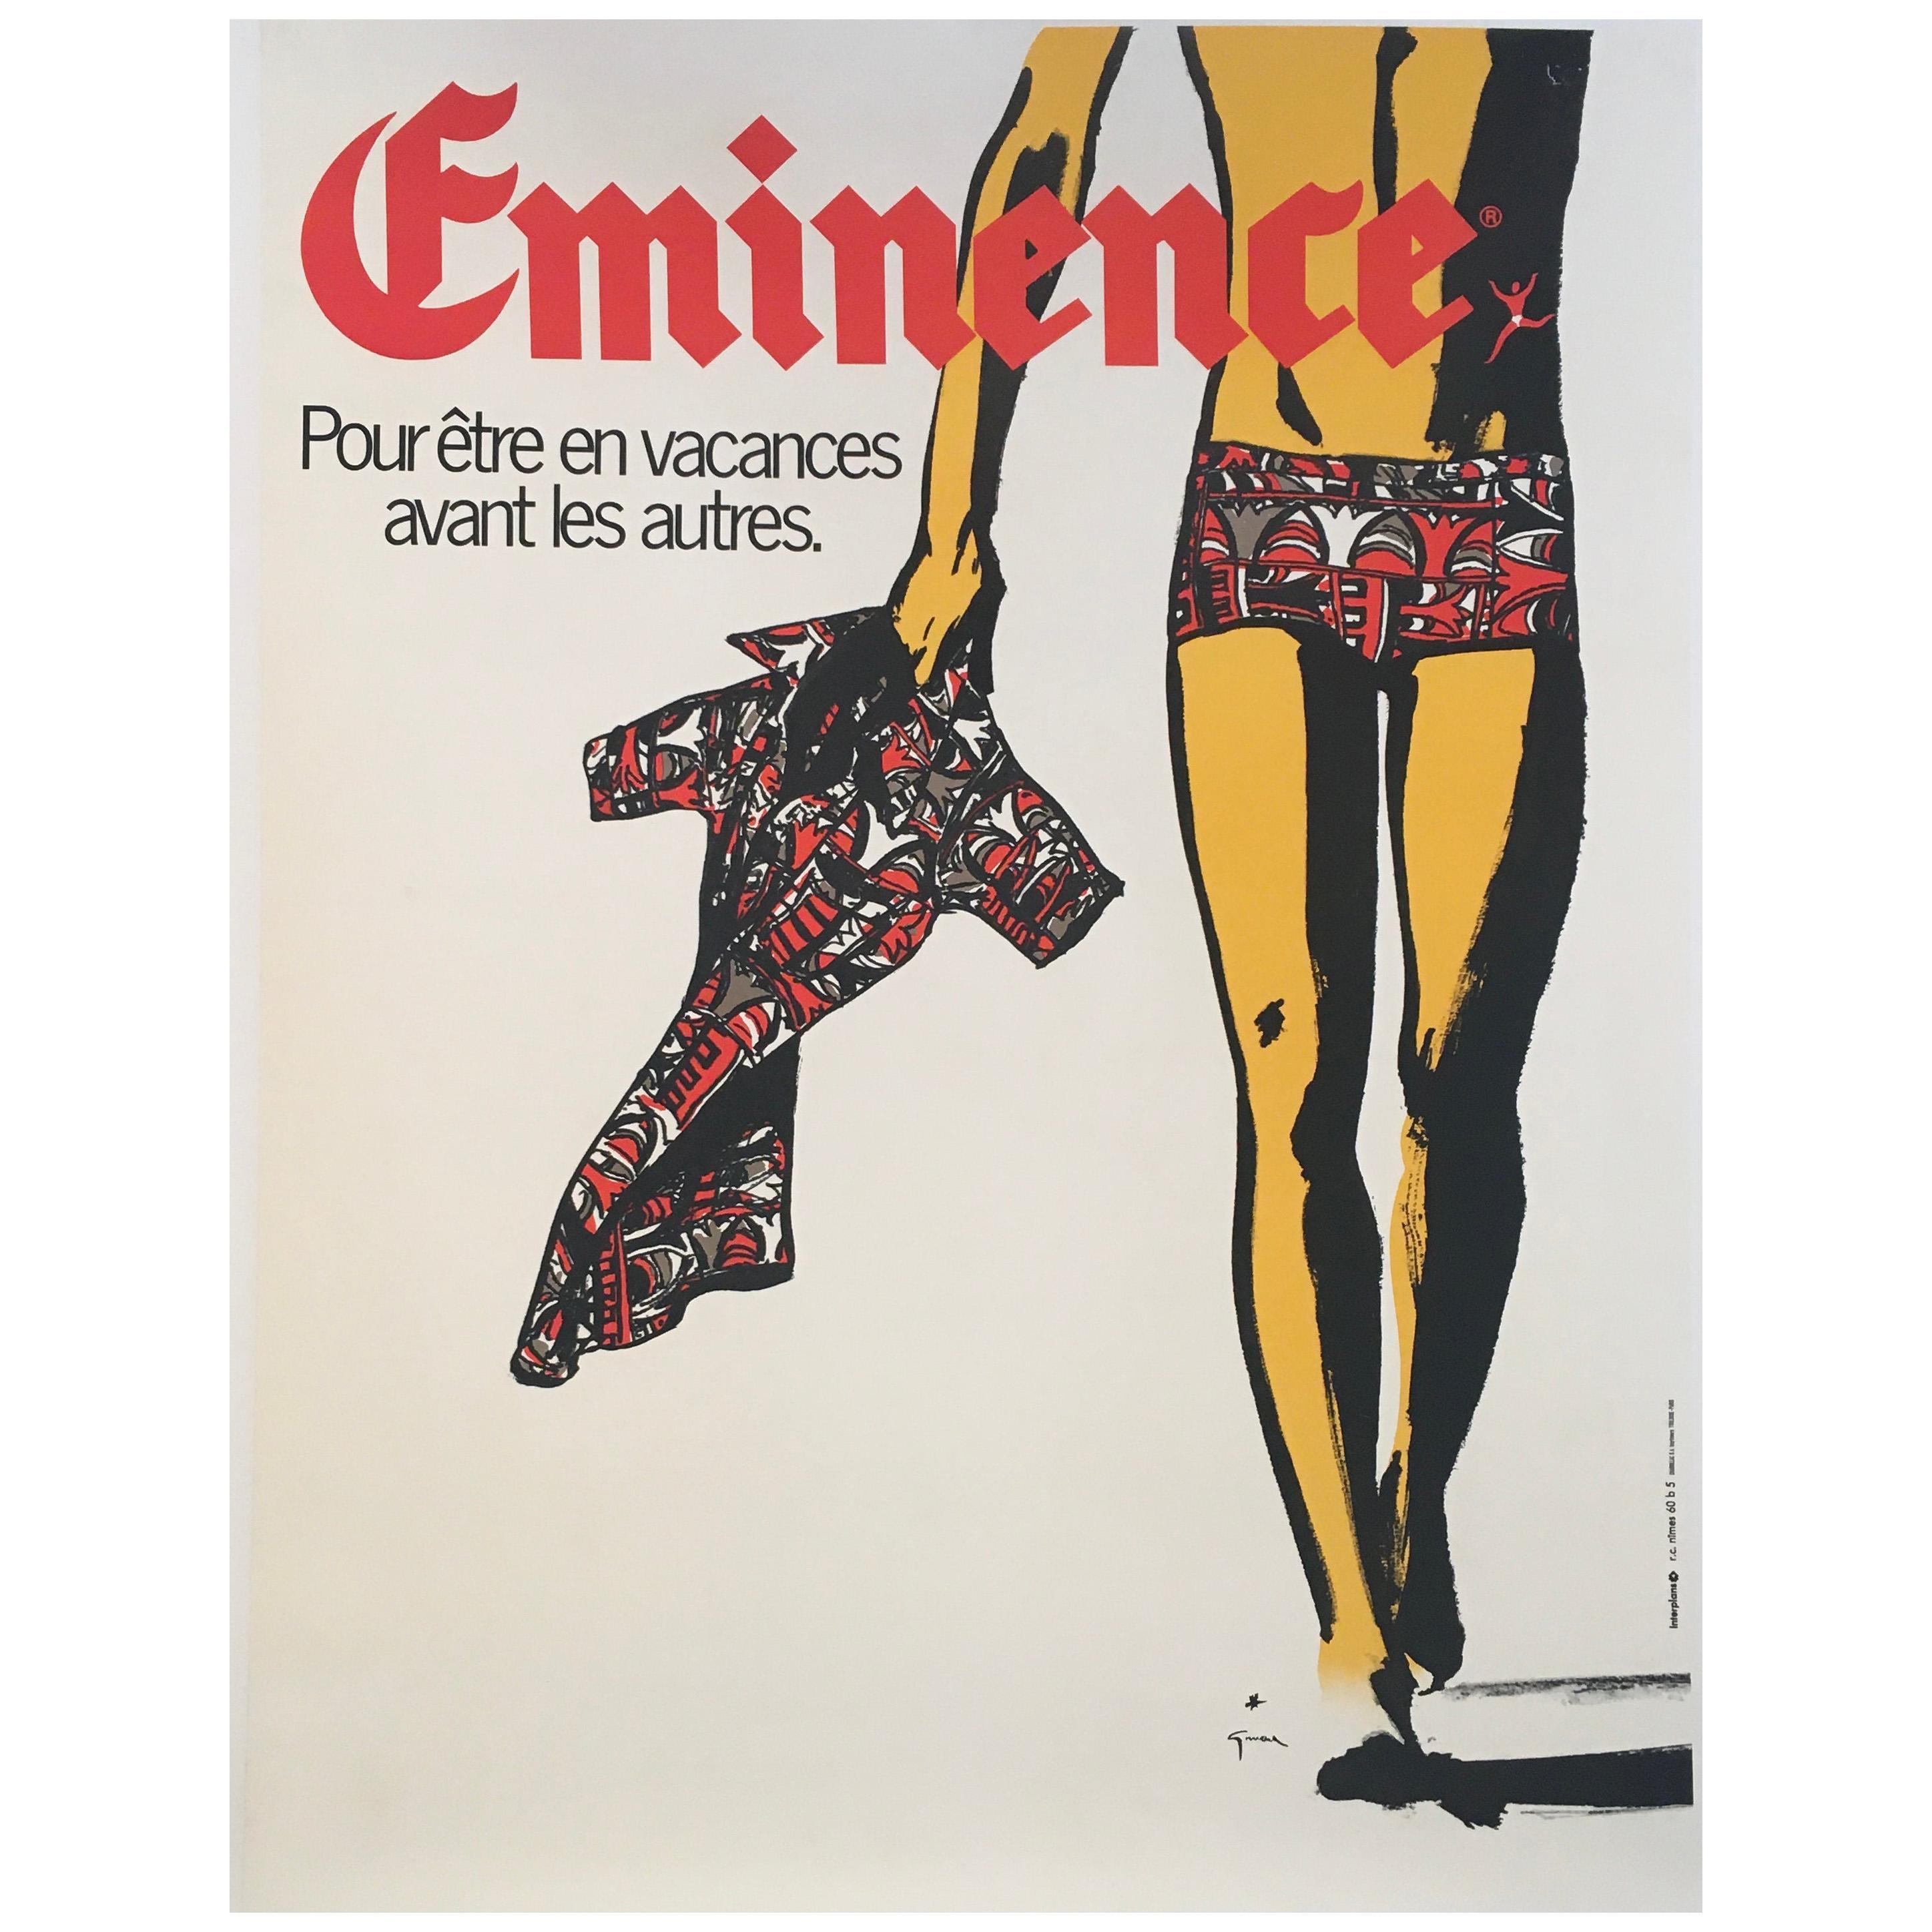 Rare Original Vintage Advertising Poster, 'Eminence' by Rene Gruau, Circa 1975